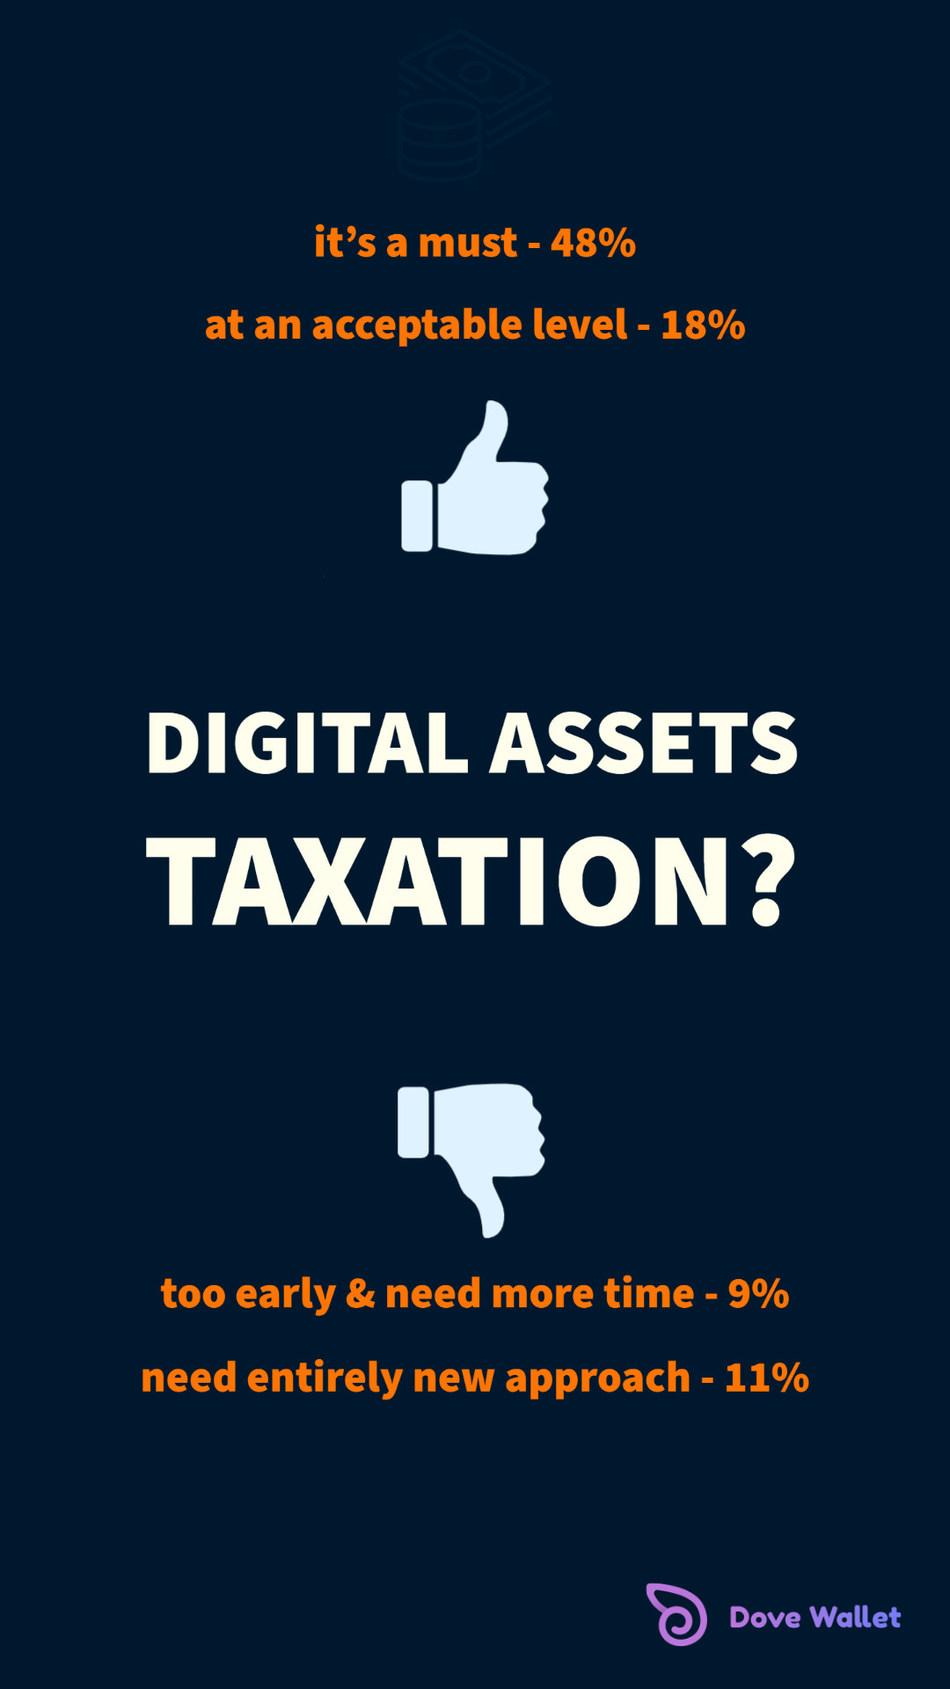 Survey on digital asset taxation